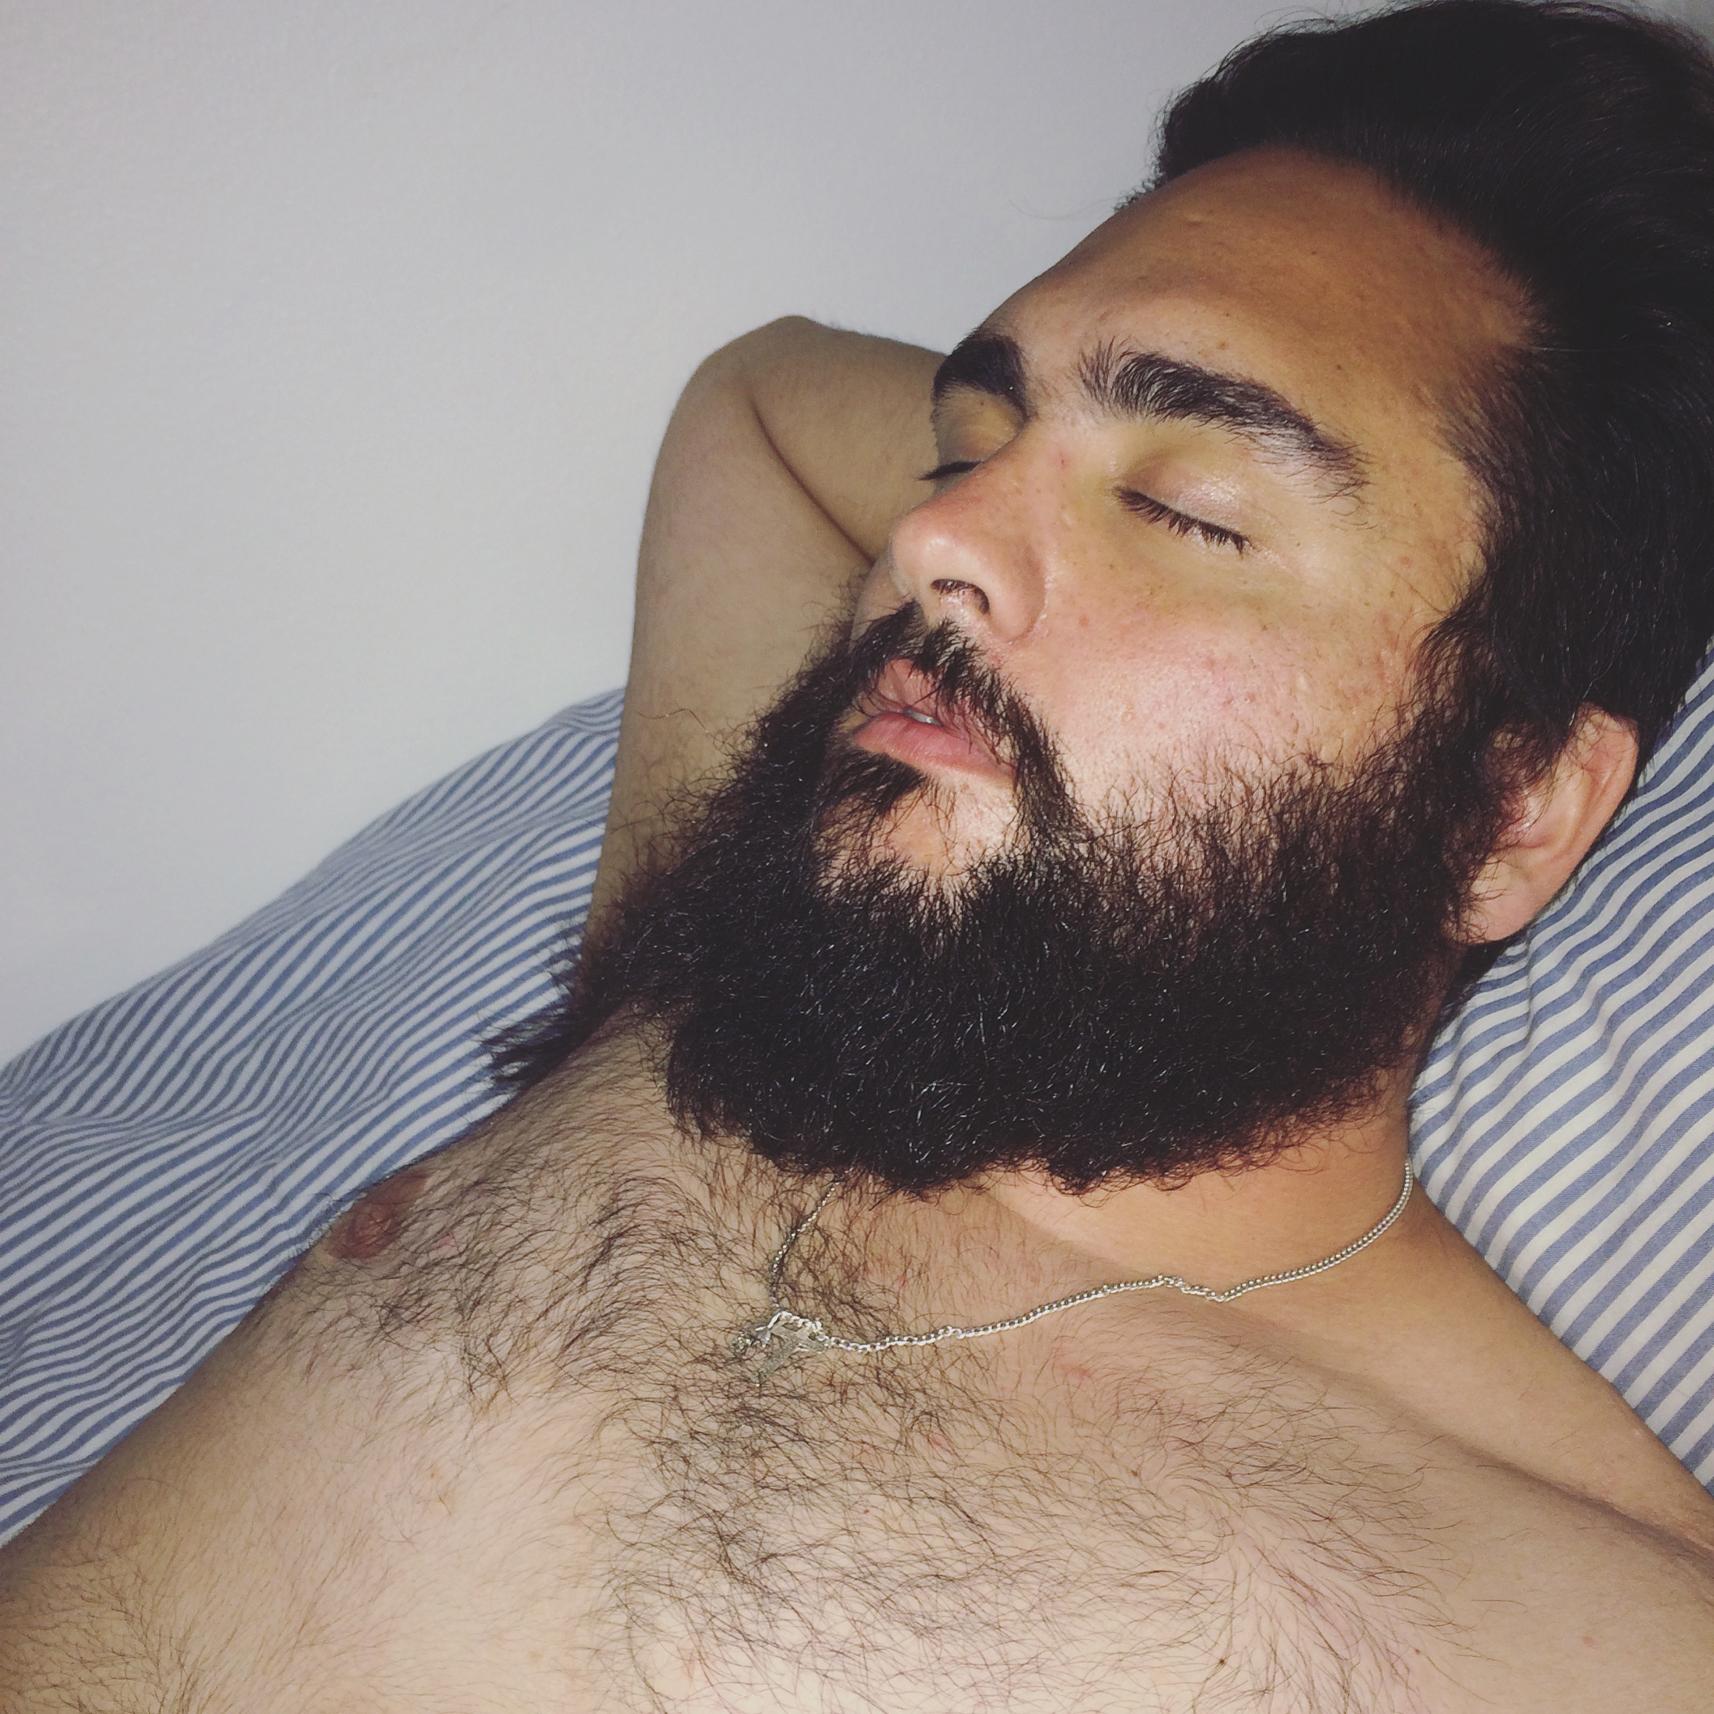 danielle harris breast size